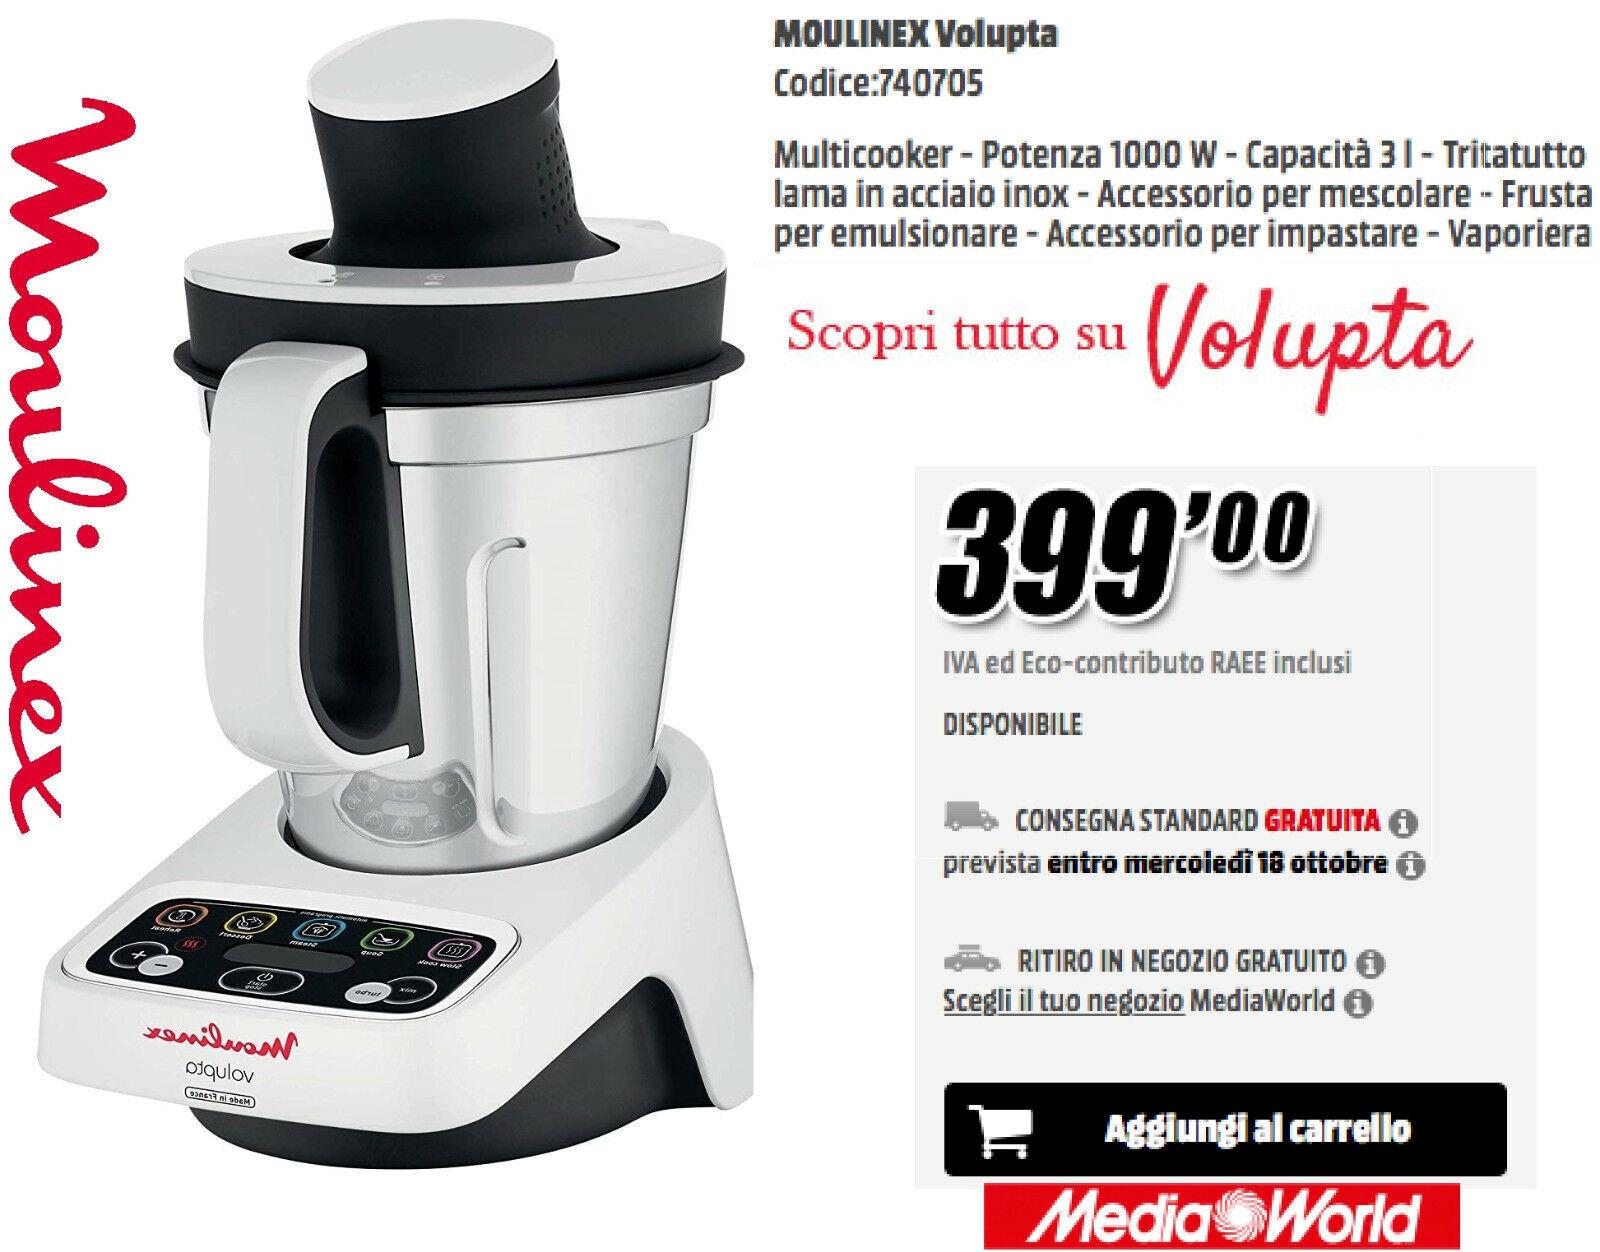 Imetec Cuko Prezzo Mediaworld.Moulinex Volupta Robot Da Cucina Hf403112